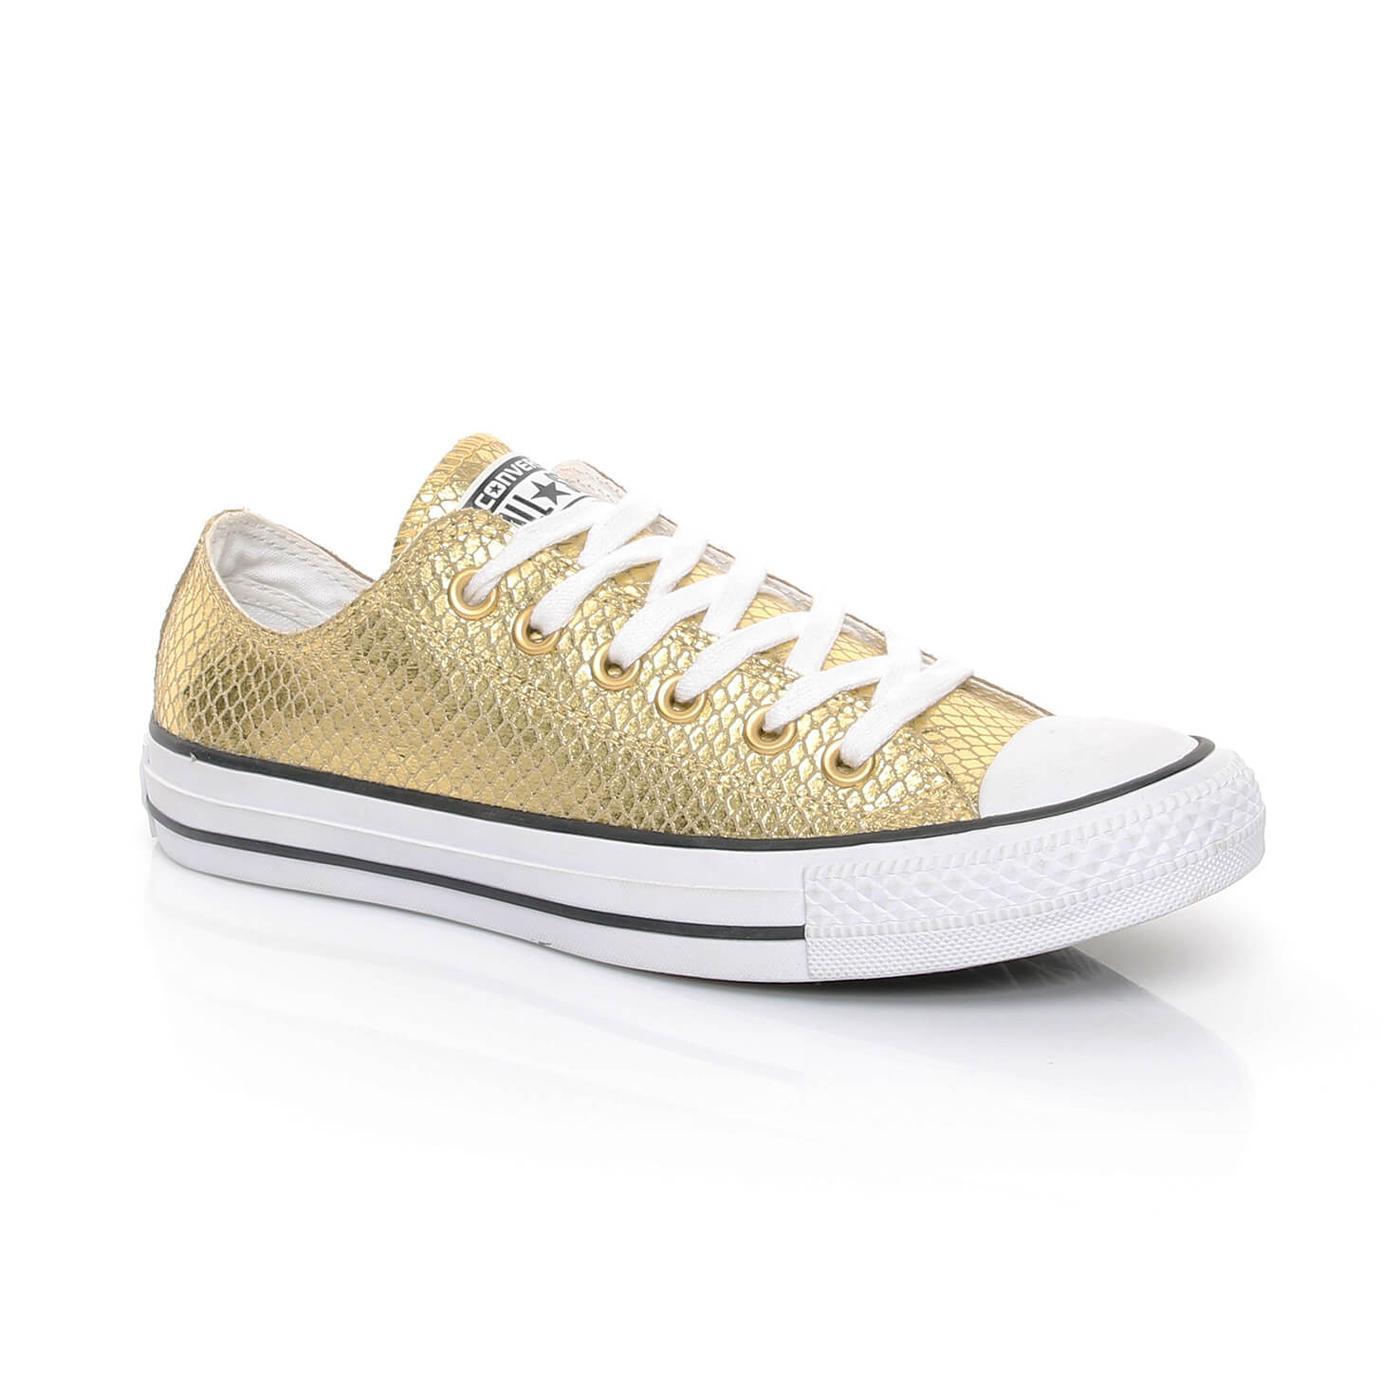 Converse Chuck Taylor All Star Kadın Altin Sneaker